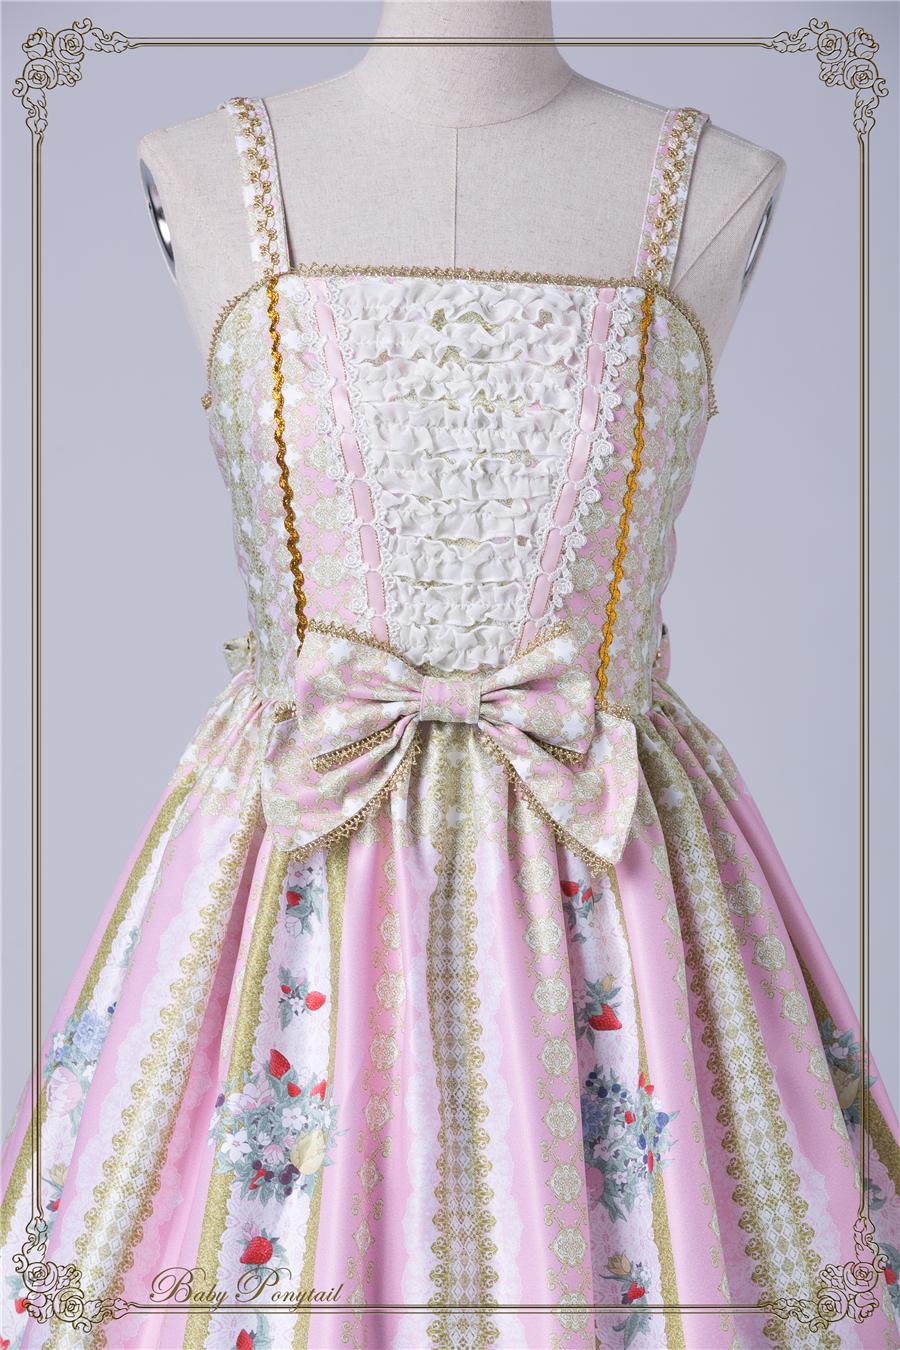 Baby Ponytail_Stock Photo_Rococo Bouquet_JSK Pink_1.jpg